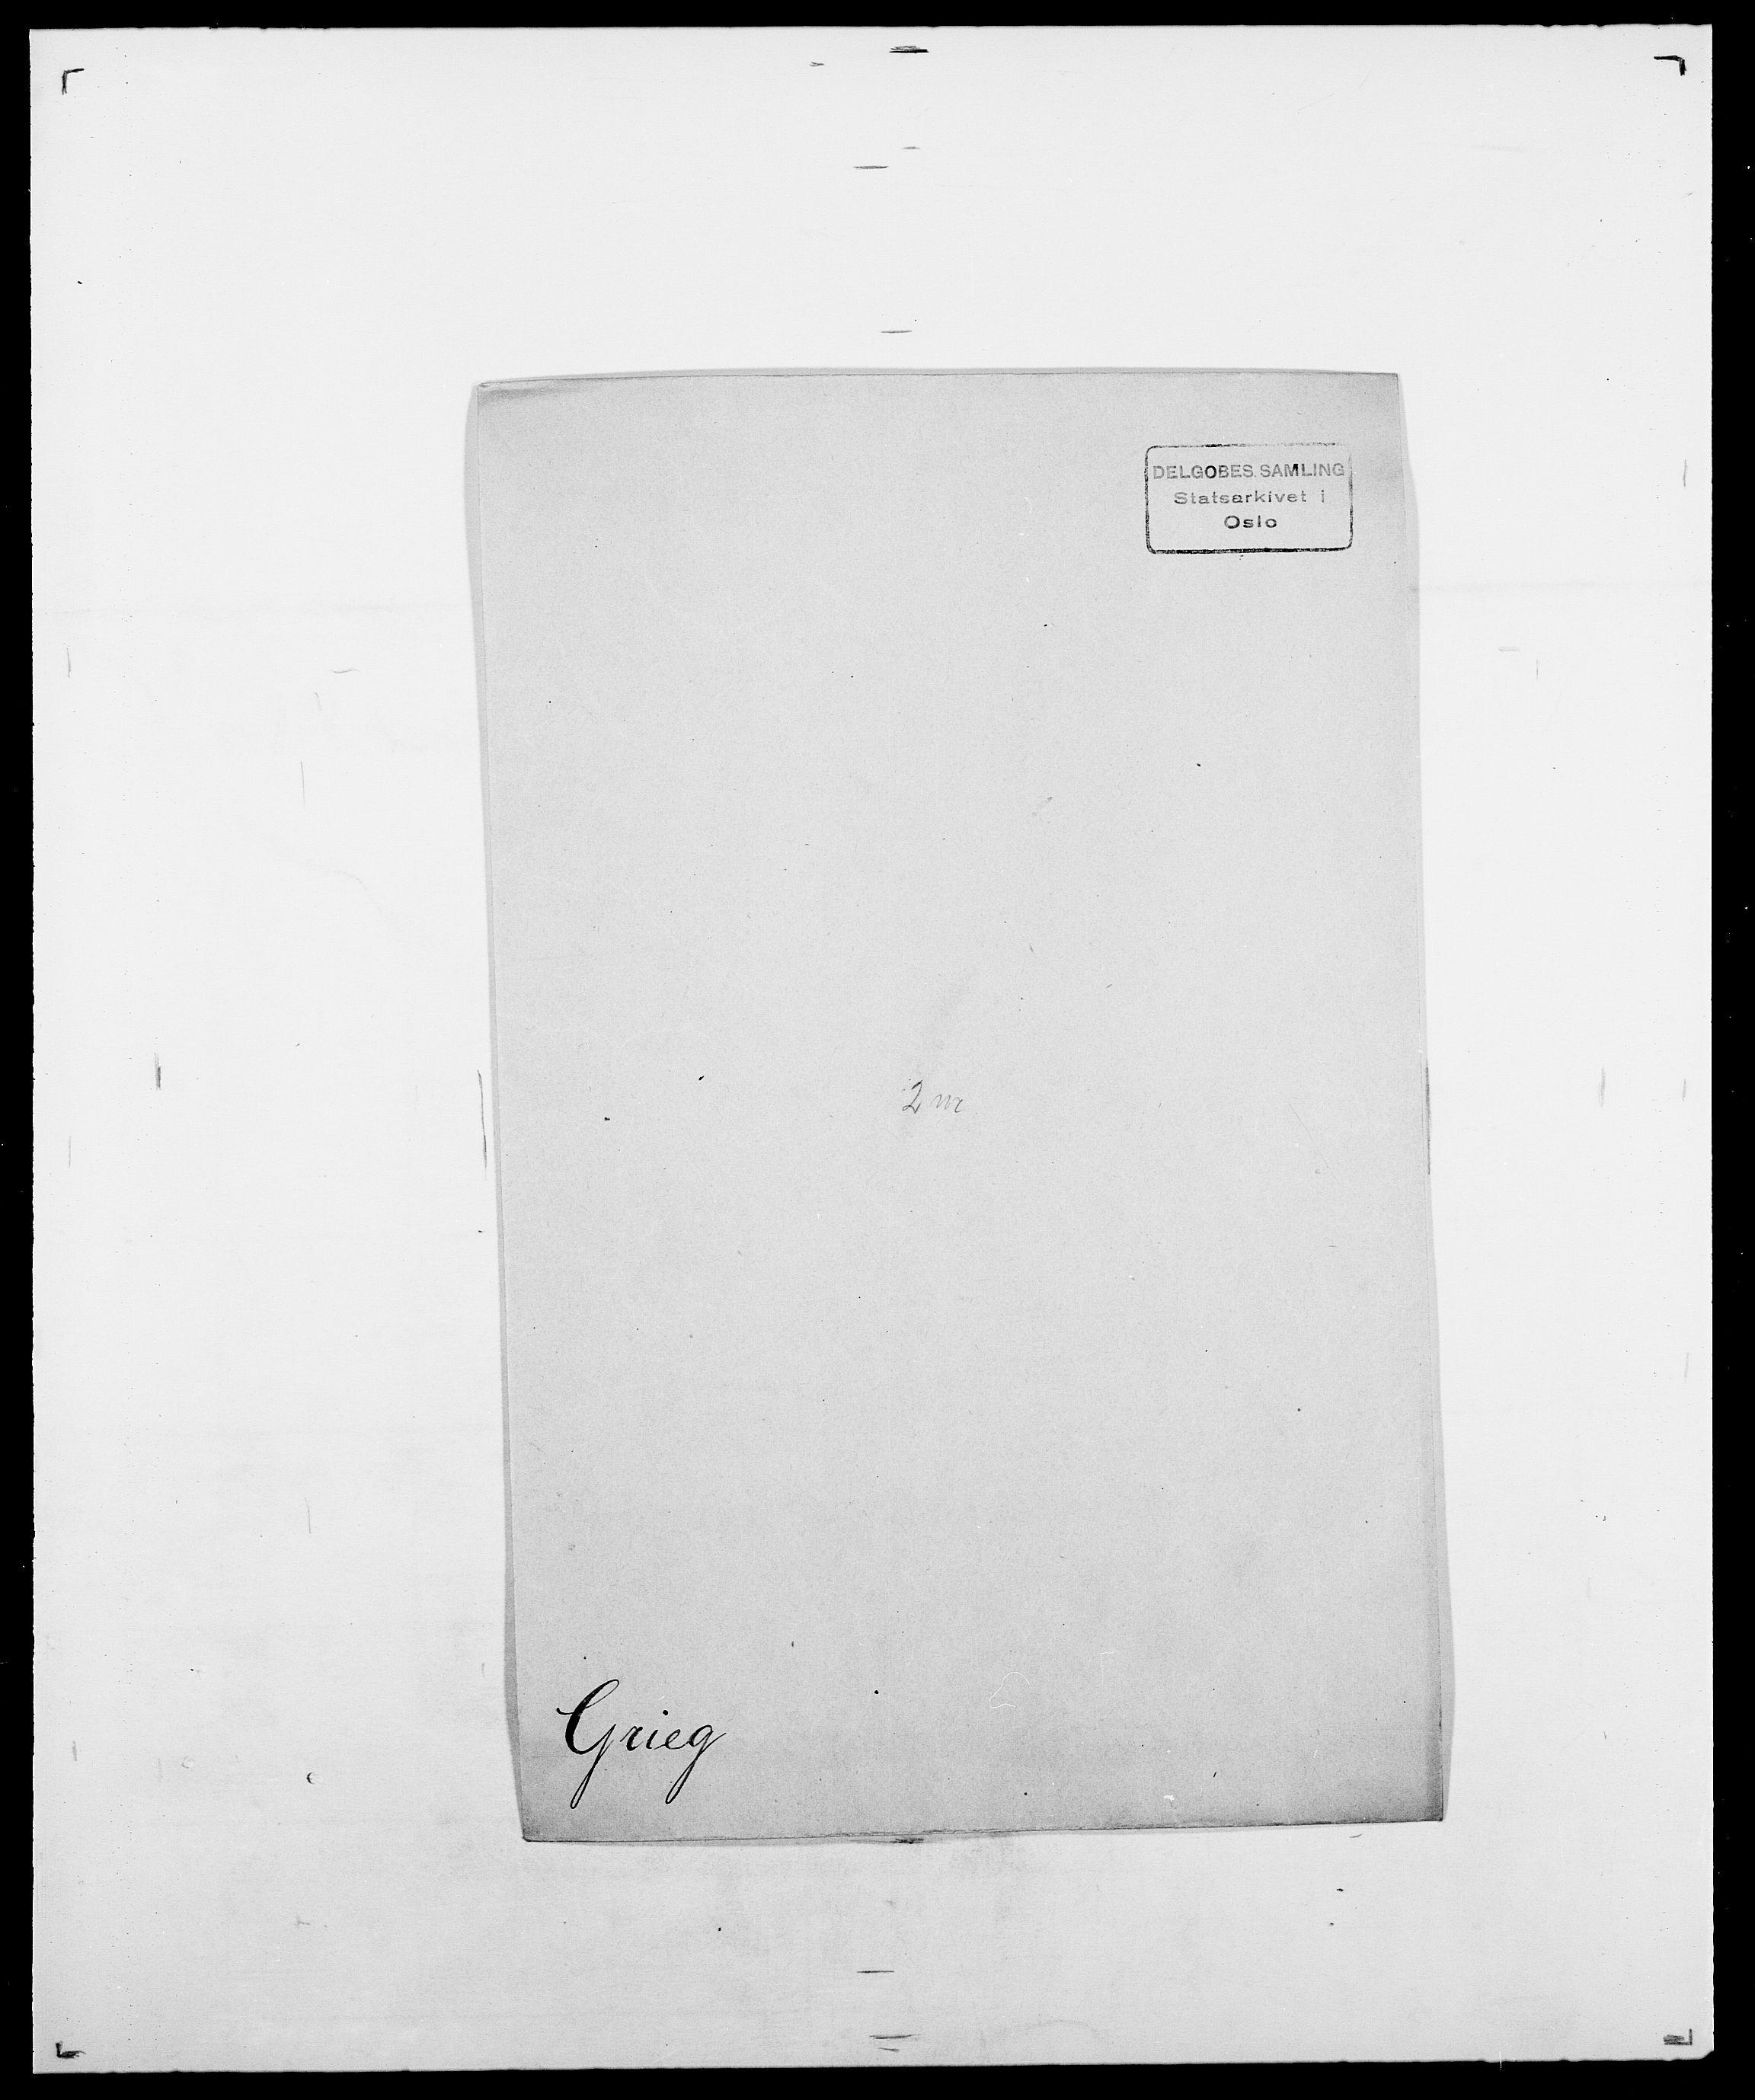 SAO, Delgobe, Charles Antoine - samling, D/Da/L0014: Giebdhausen - Grip, s. 644